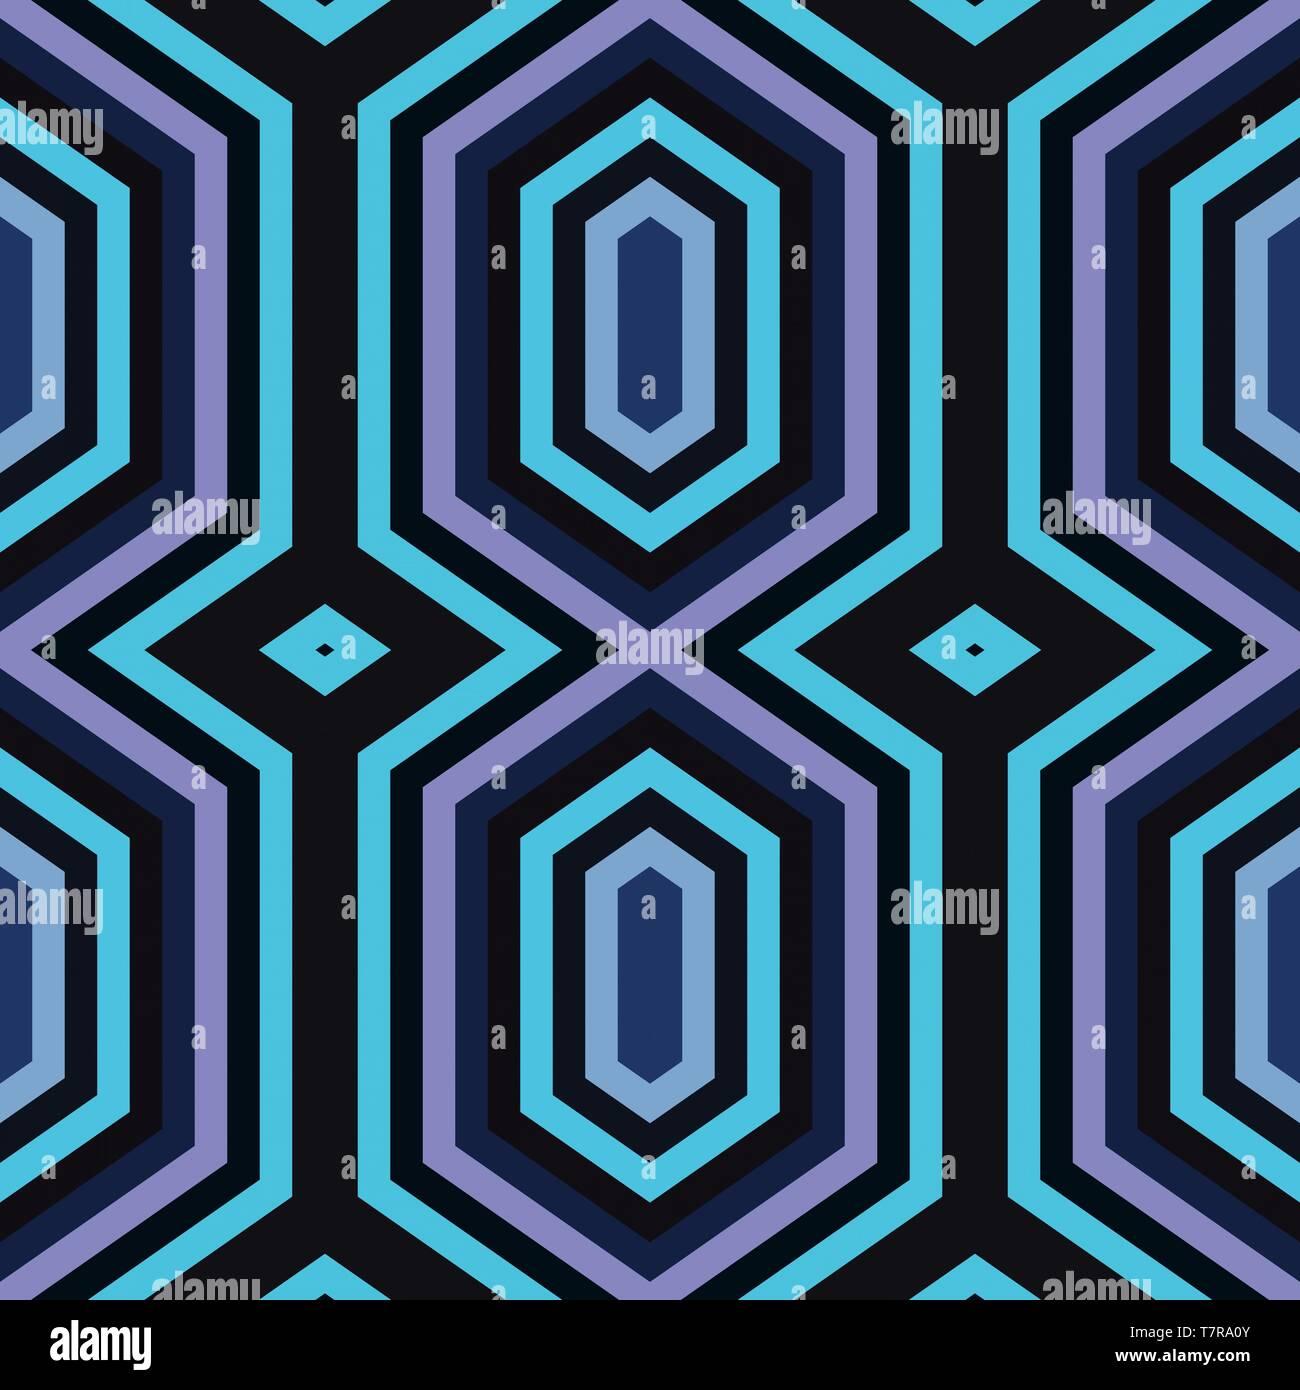 simple seamless geometric background with very dark blue